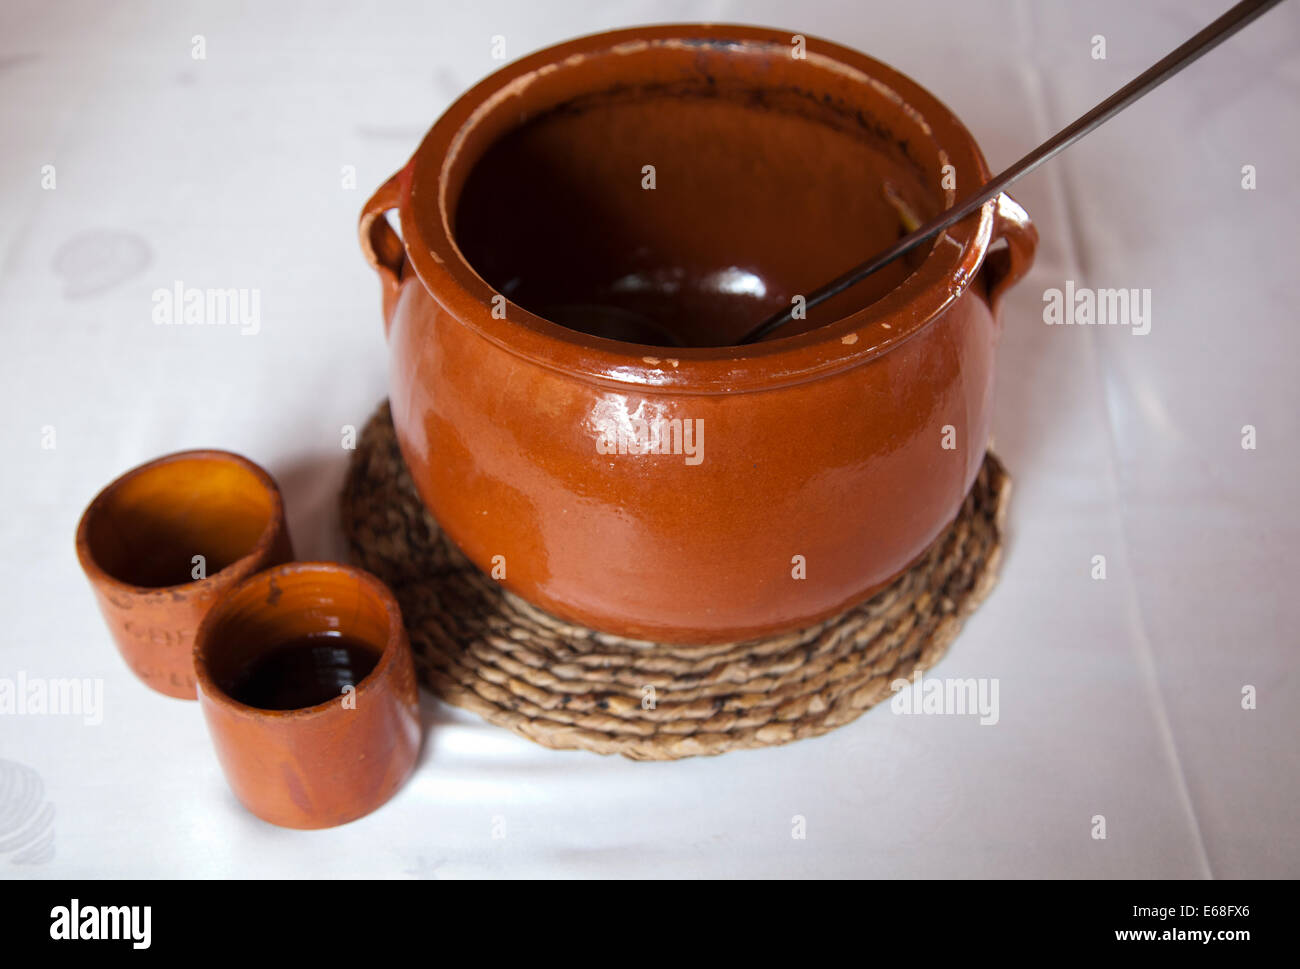 Sa Caleta Beach Restaurant Serve their unique Alcoholic Coffee from Clay Jug  in Ibiza - Stock Image